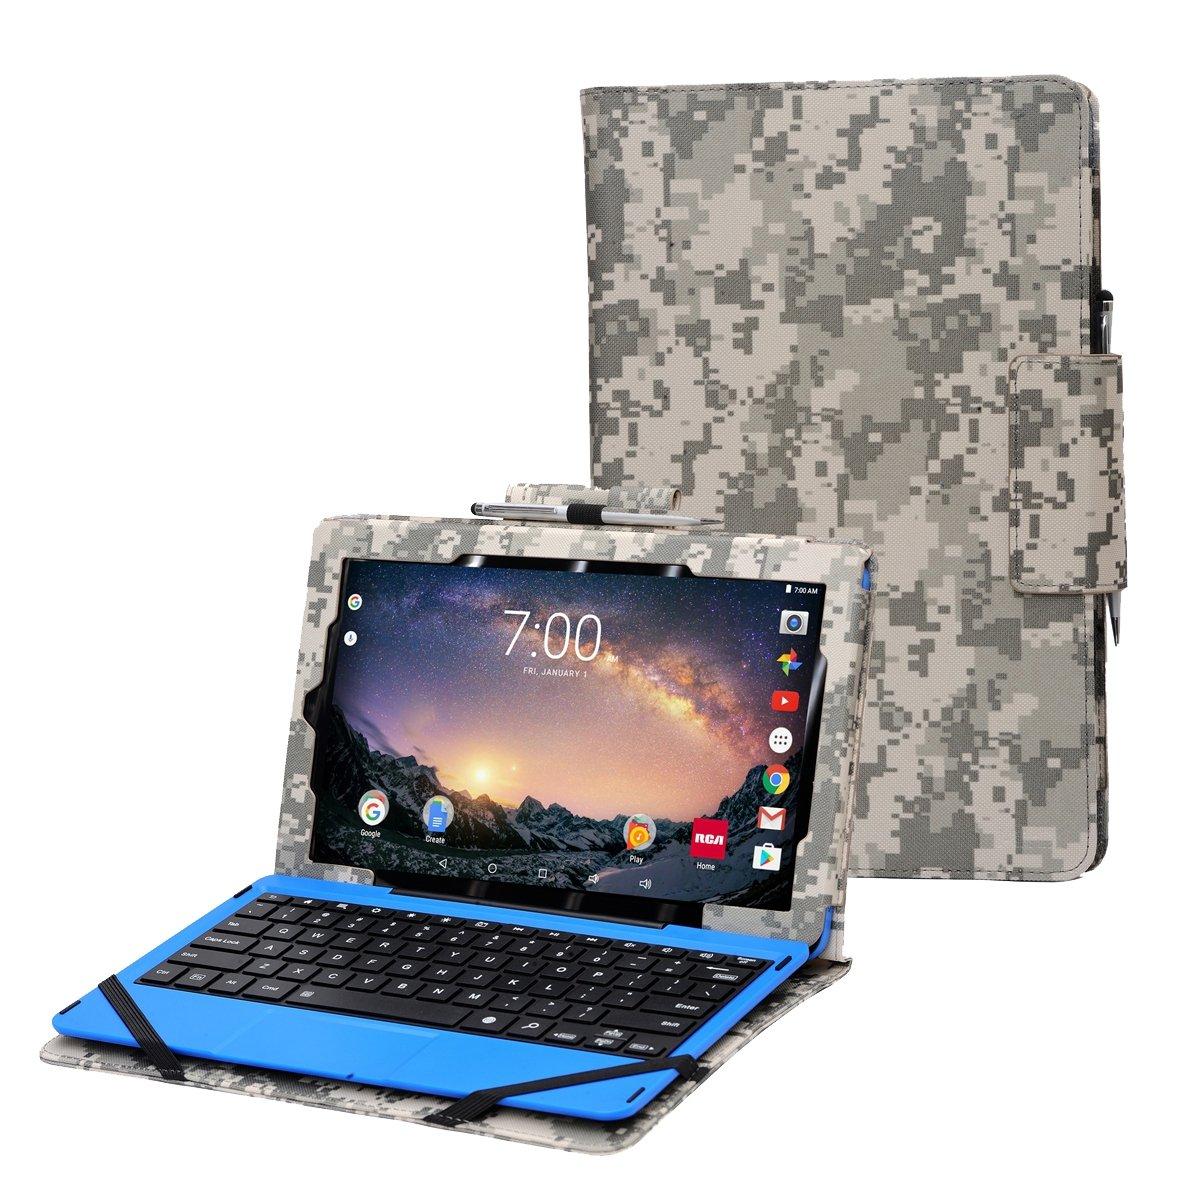 RCA Galileo Pro 11.5 case by i-UniK for RCA Galileo Pro 11.5' Model#RCT6513W87DK C Tablet with Keyboard Case [Bonus Stylus] (Purple)